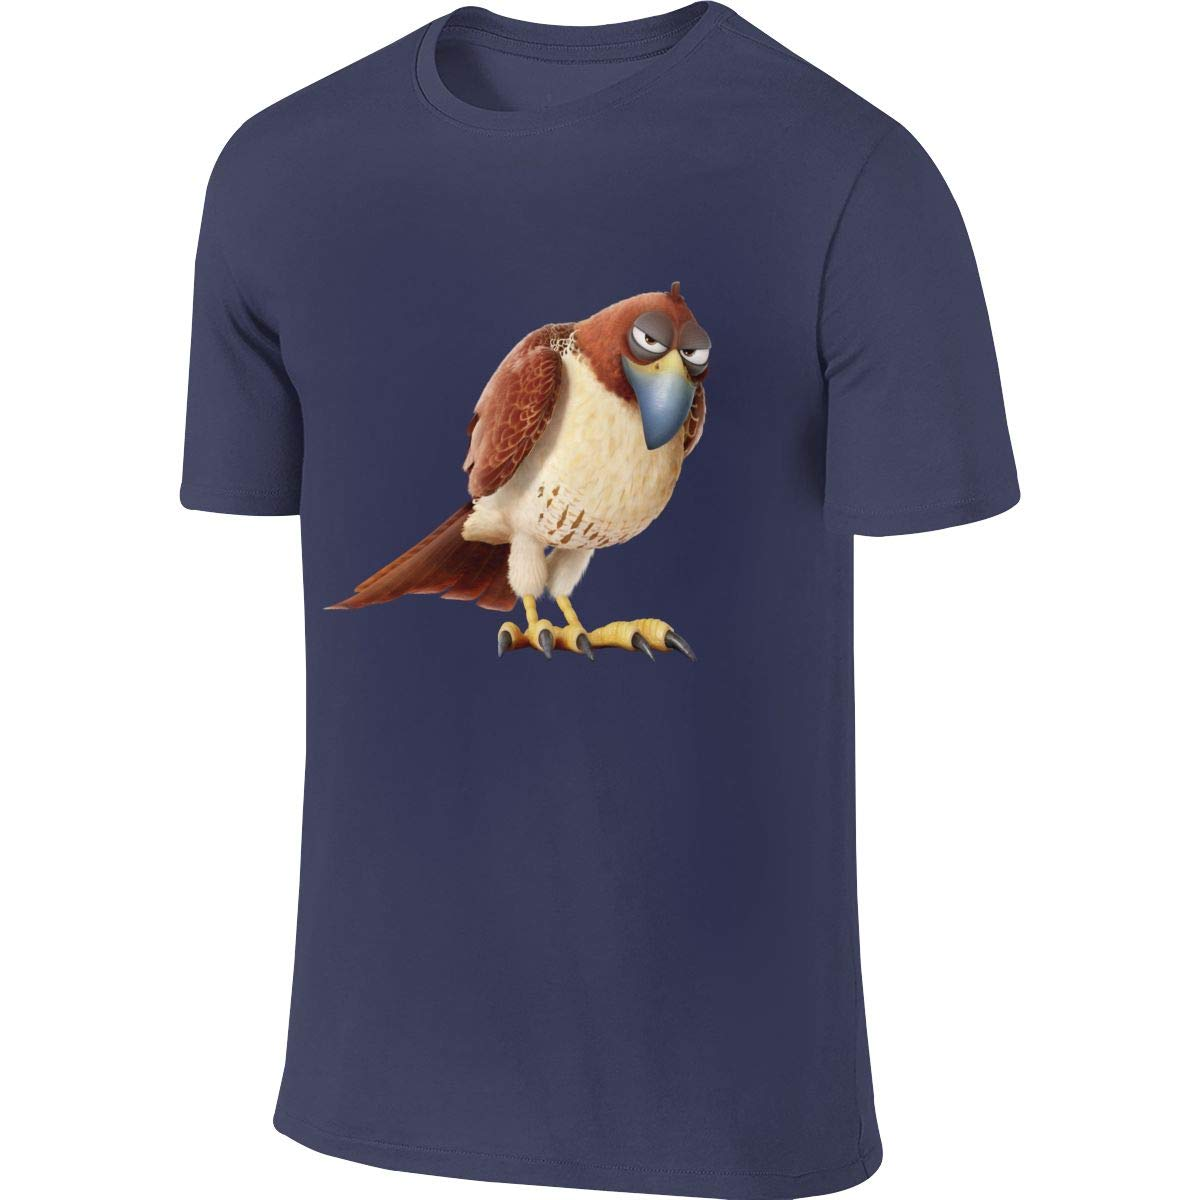 BYSKA Men Designed Breathable Tees The Secret Life of Pets Tiberius T-Shirt